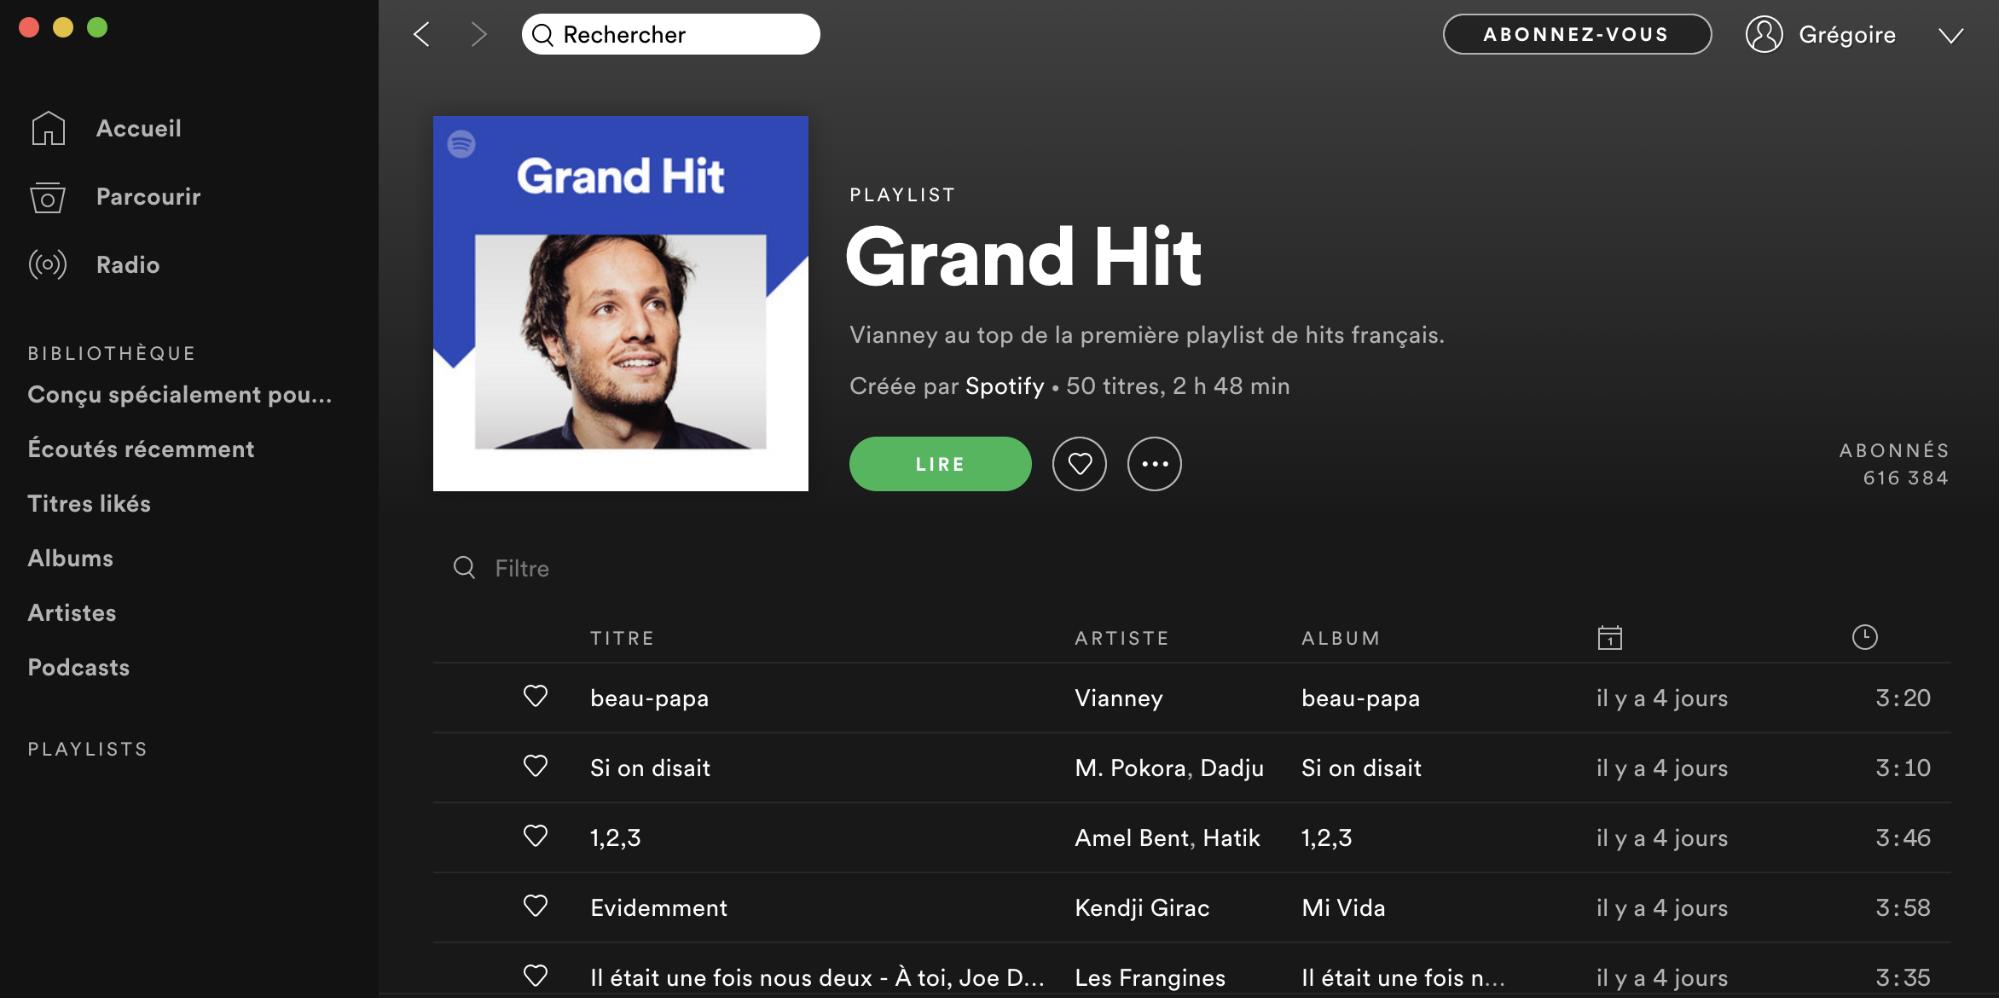 Playlist Grand Hit